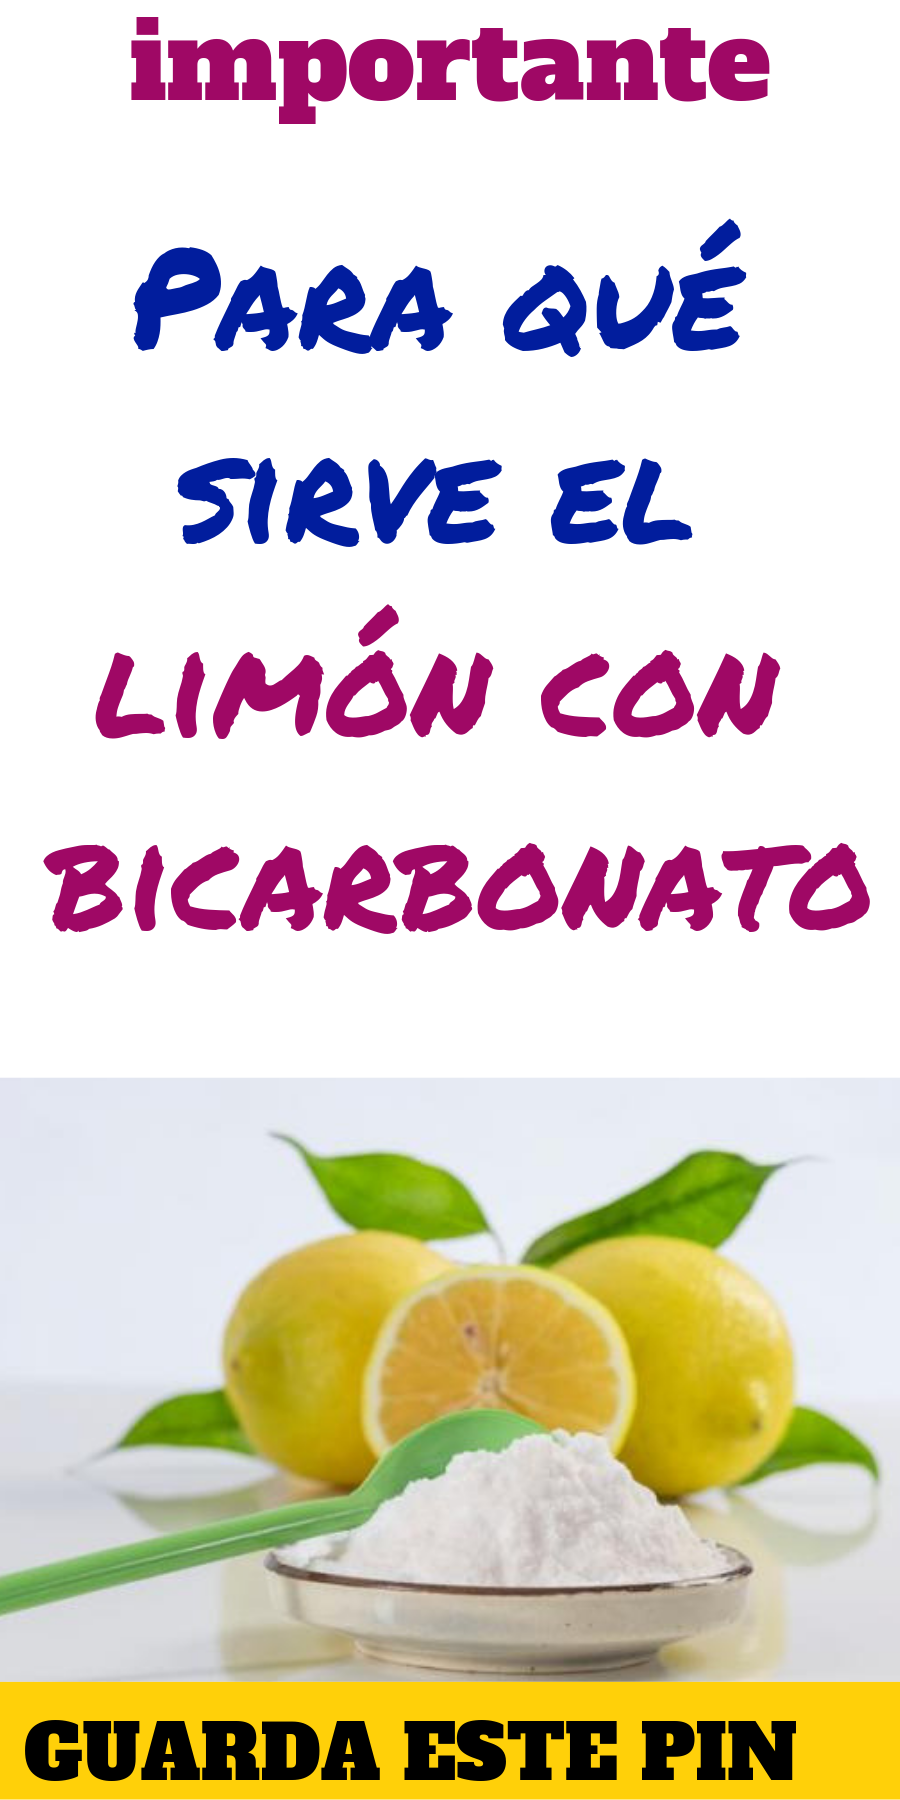 bicarbonato mislead limon sirve pregnancy solfa syllable garganta